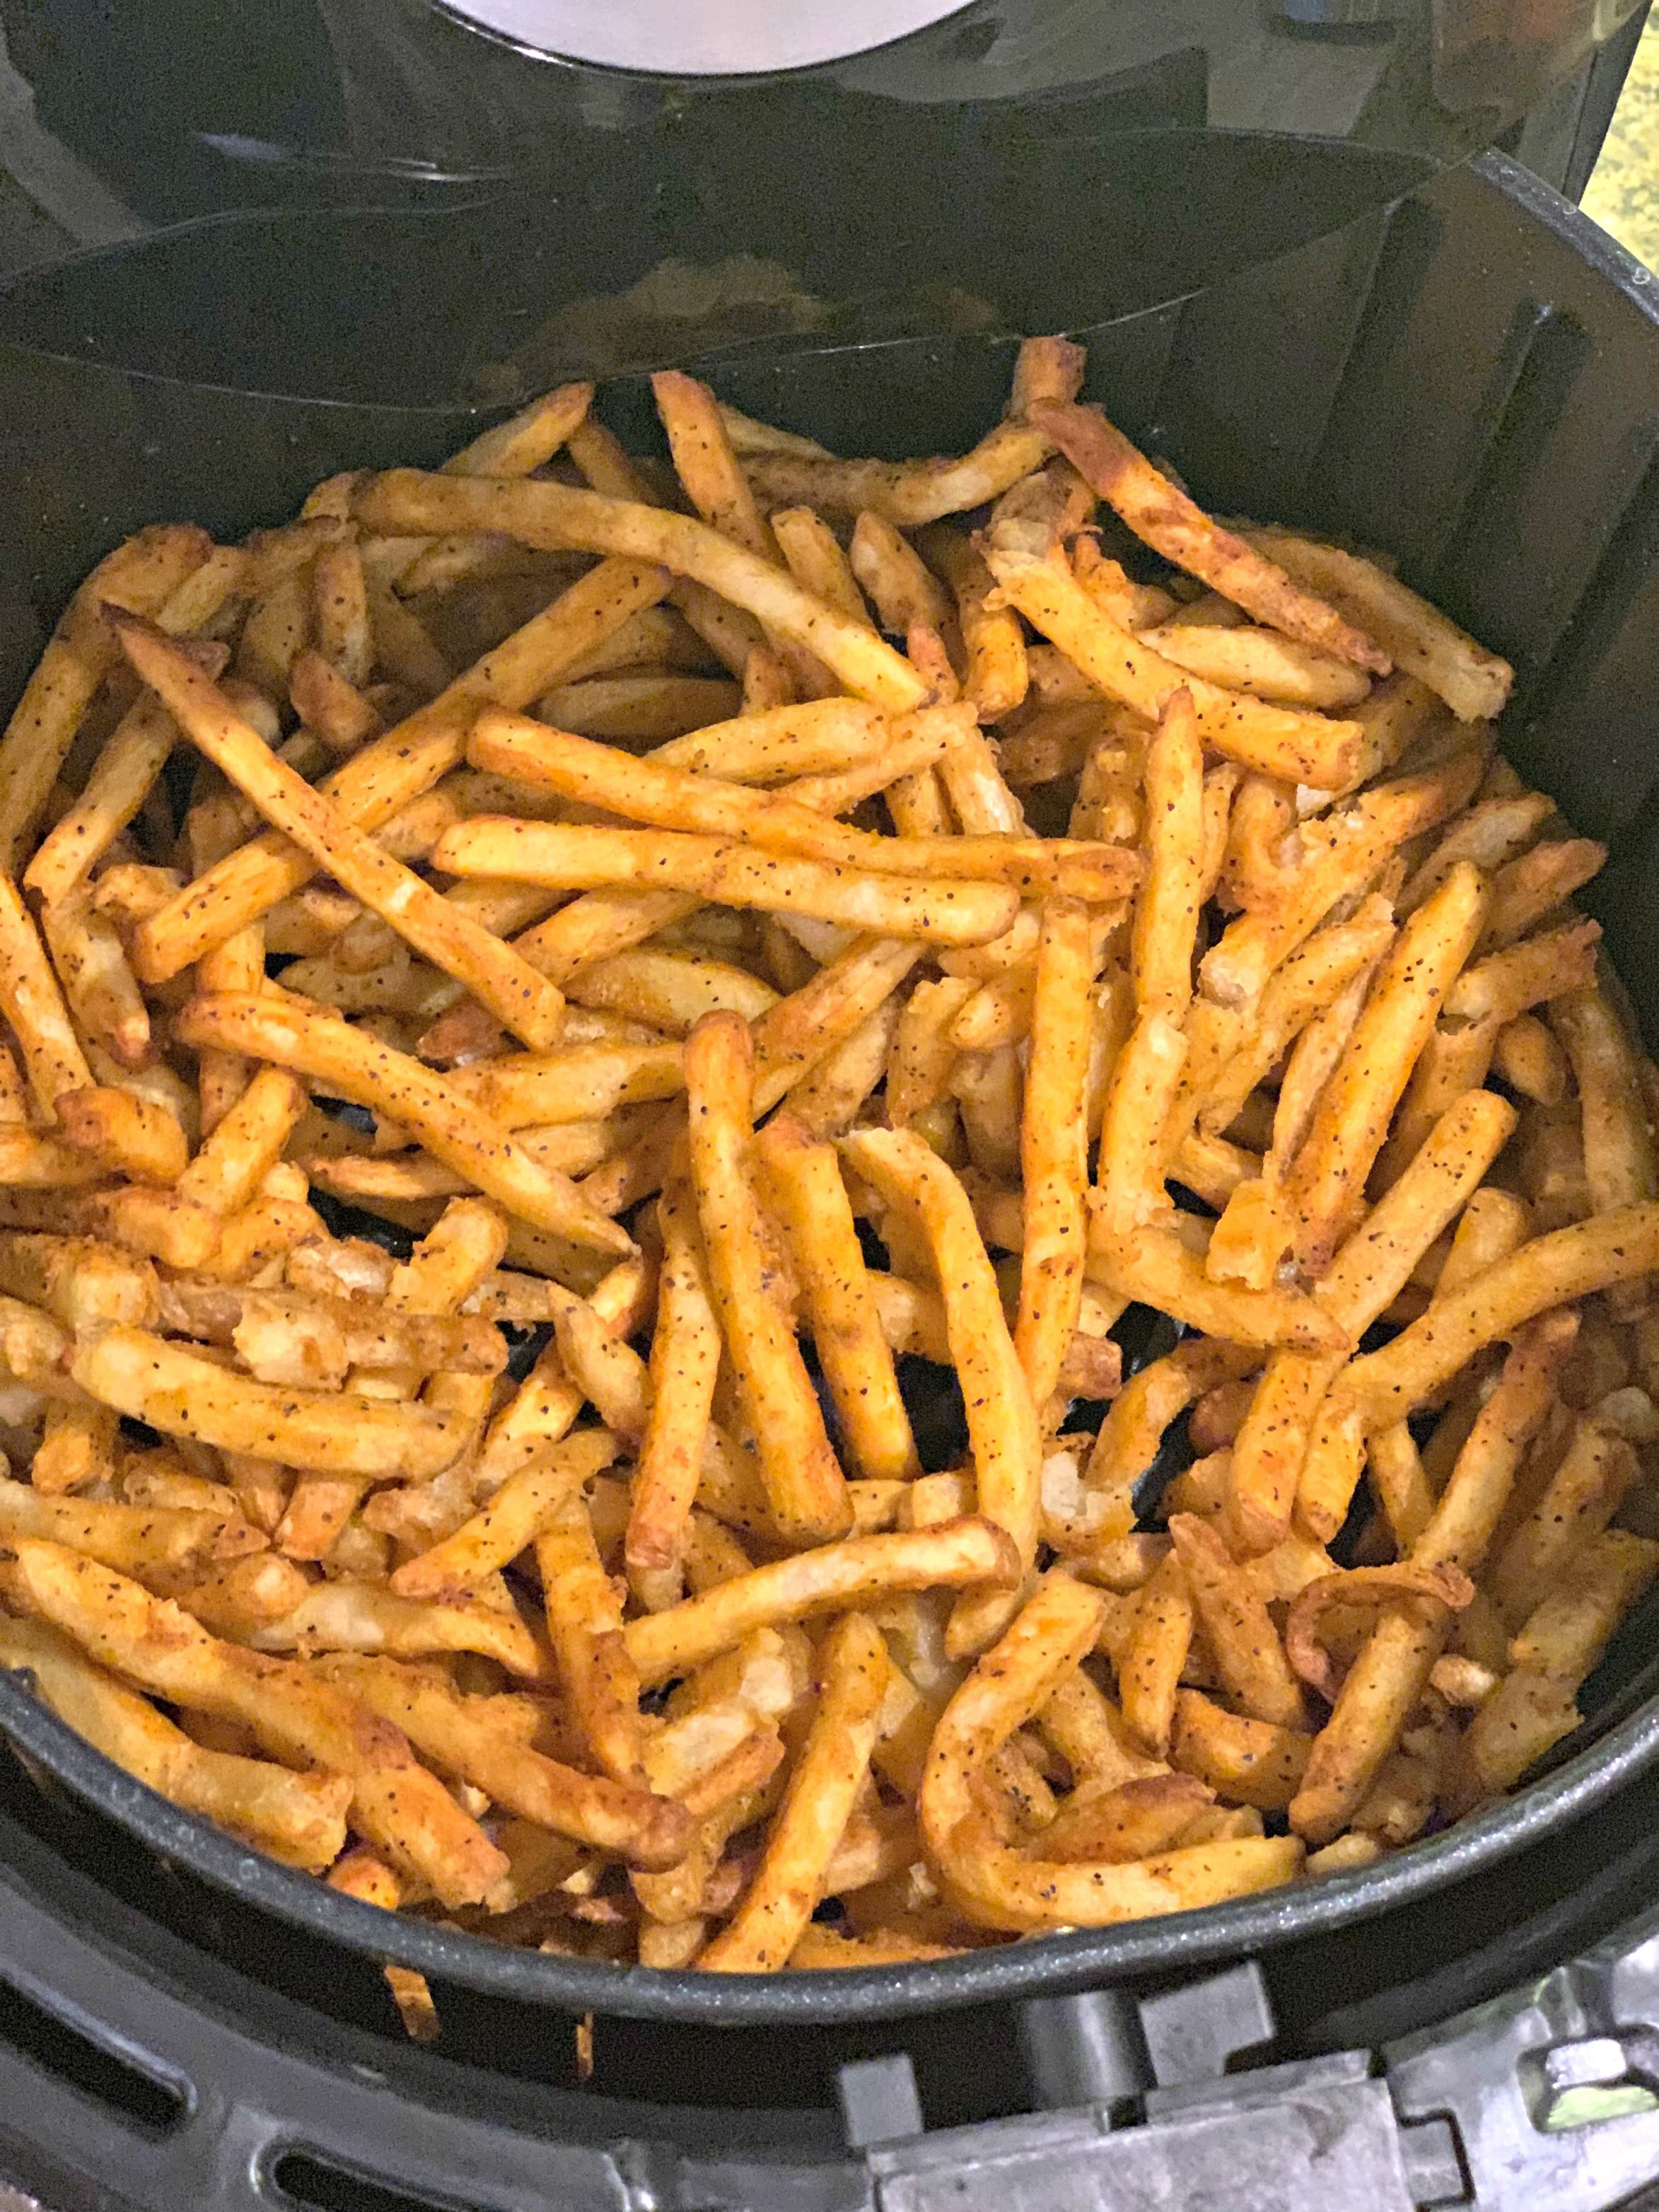 Air Fryer Frozen French Fries Recipe Air fryer recipes